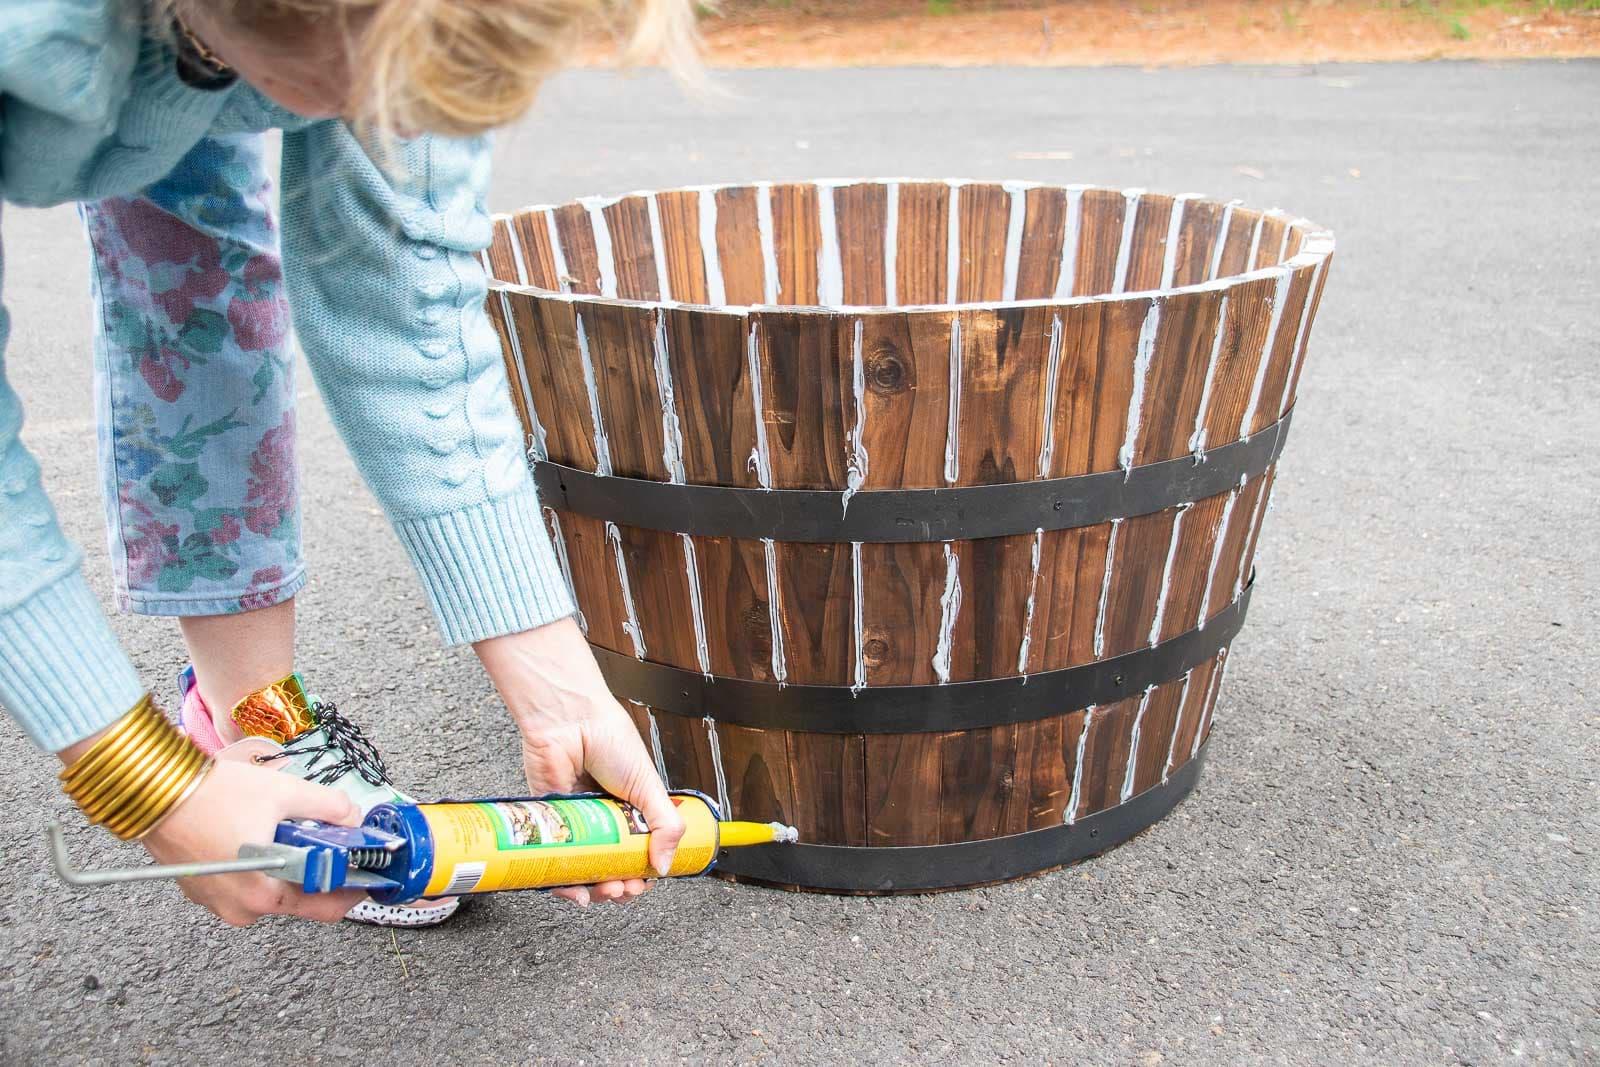 caulk the seams of the barrel planter